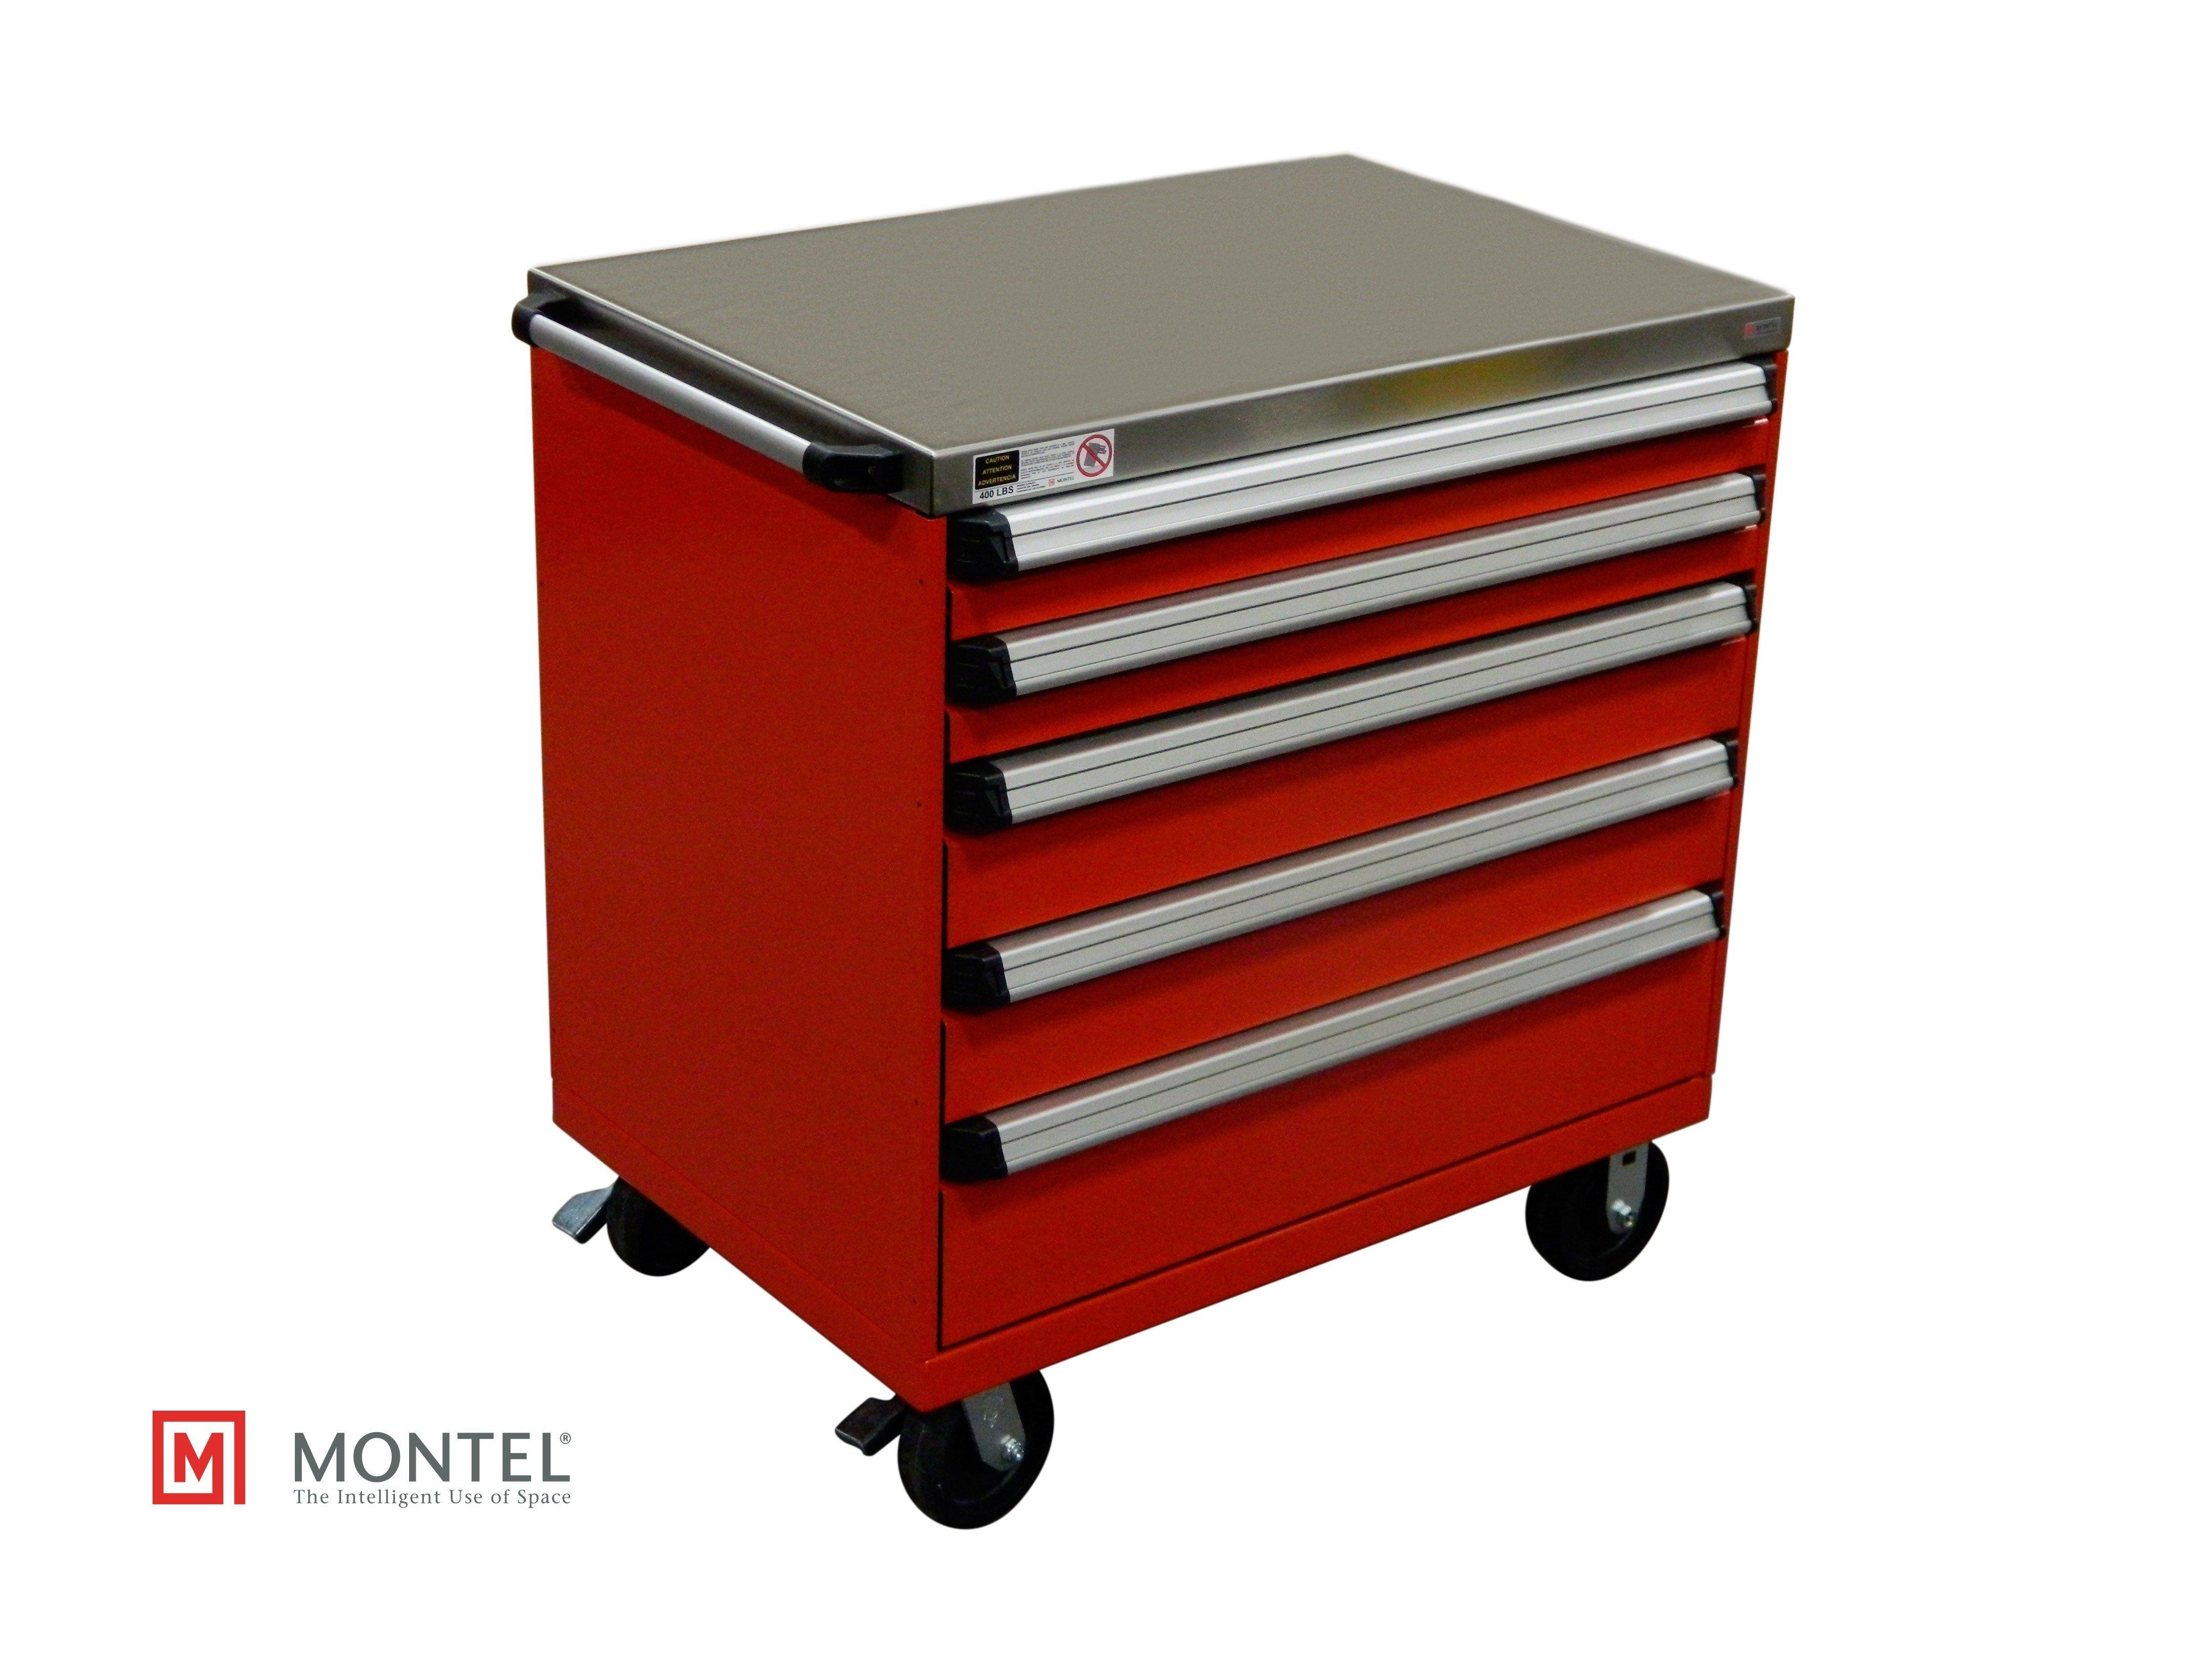 Coffre à tiroirs Montel